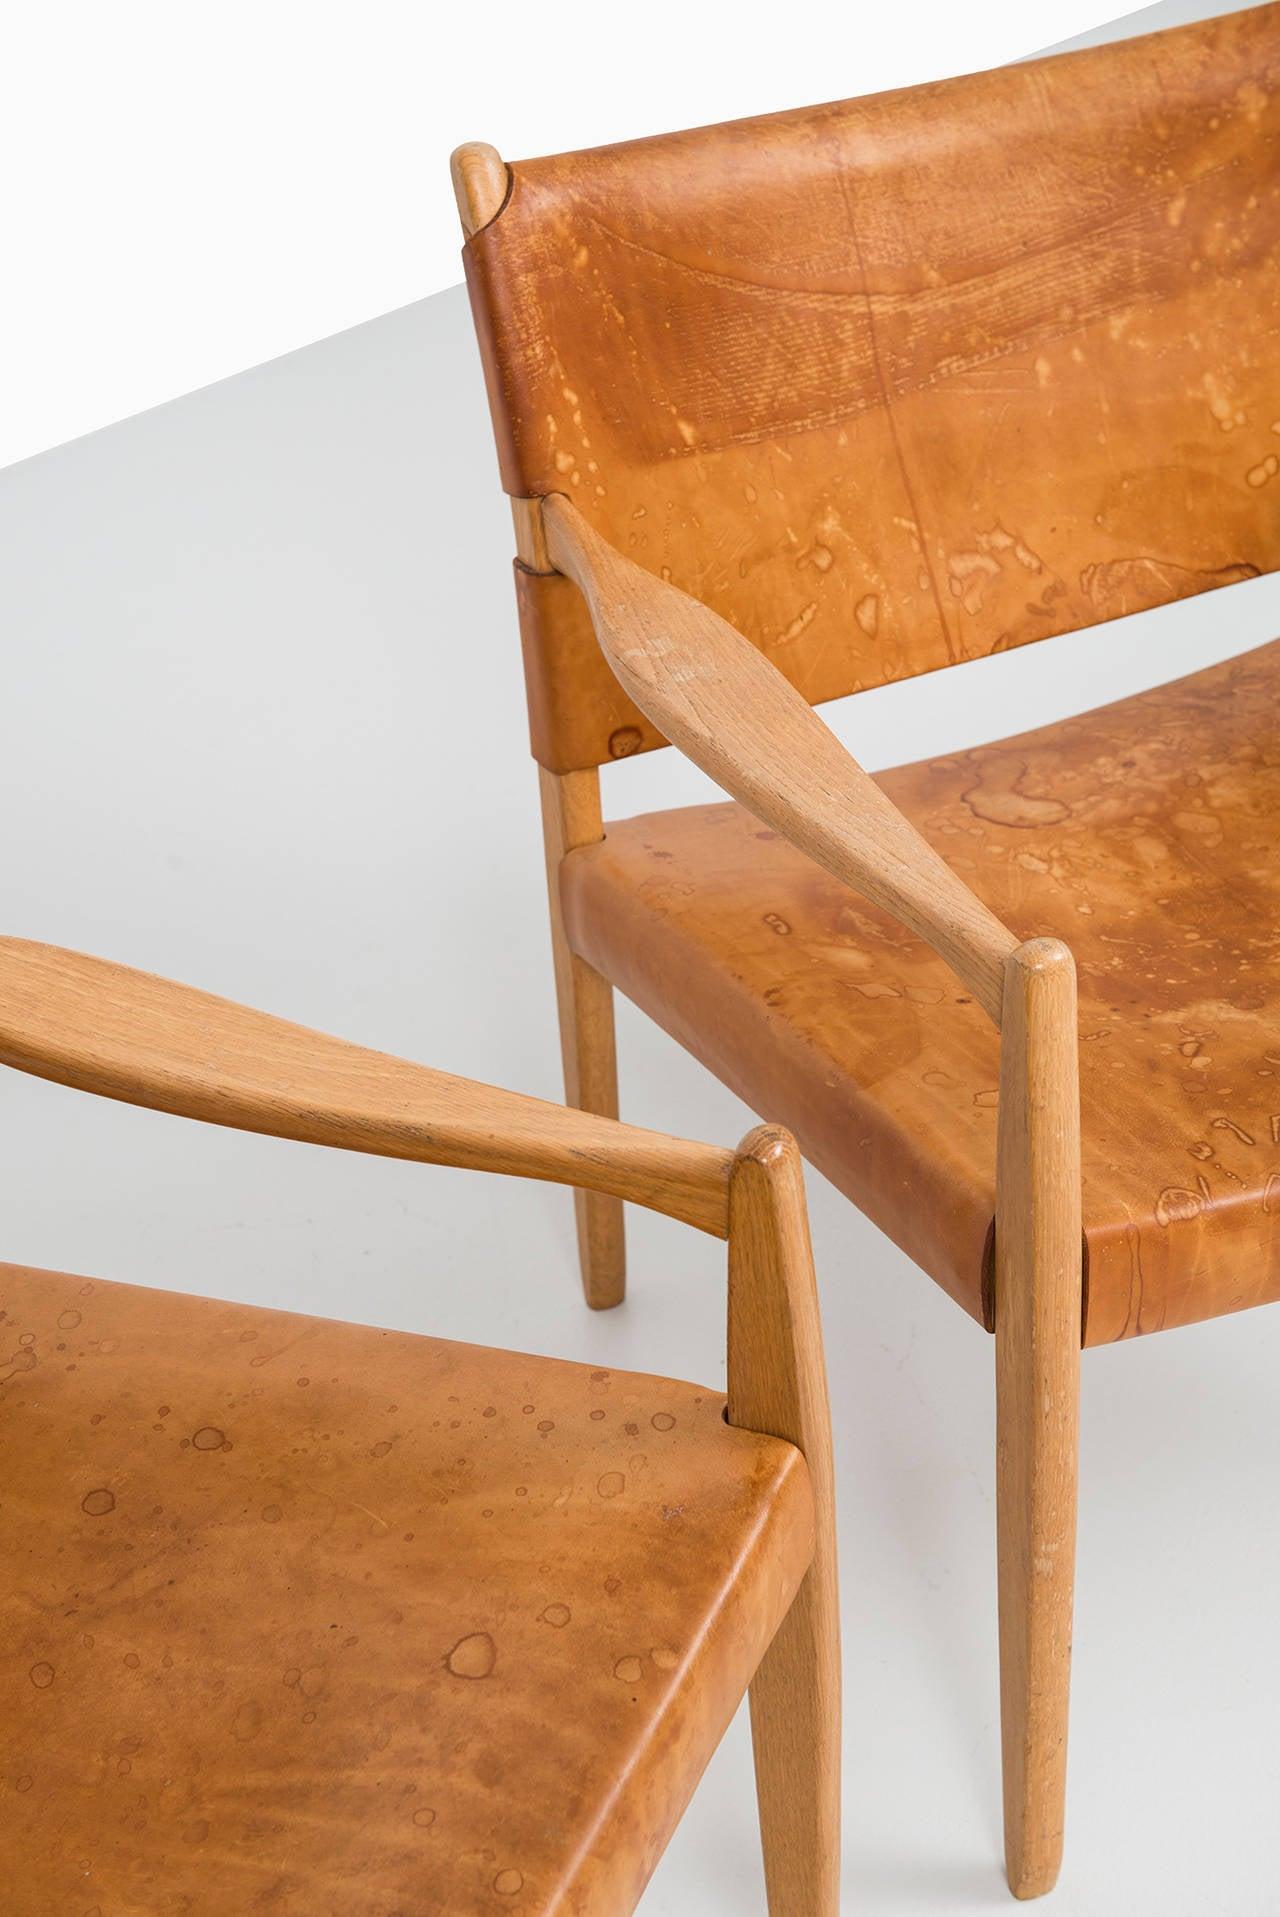 Per-Olof Scotte easy chairs model Premiär produced in Sweden 1